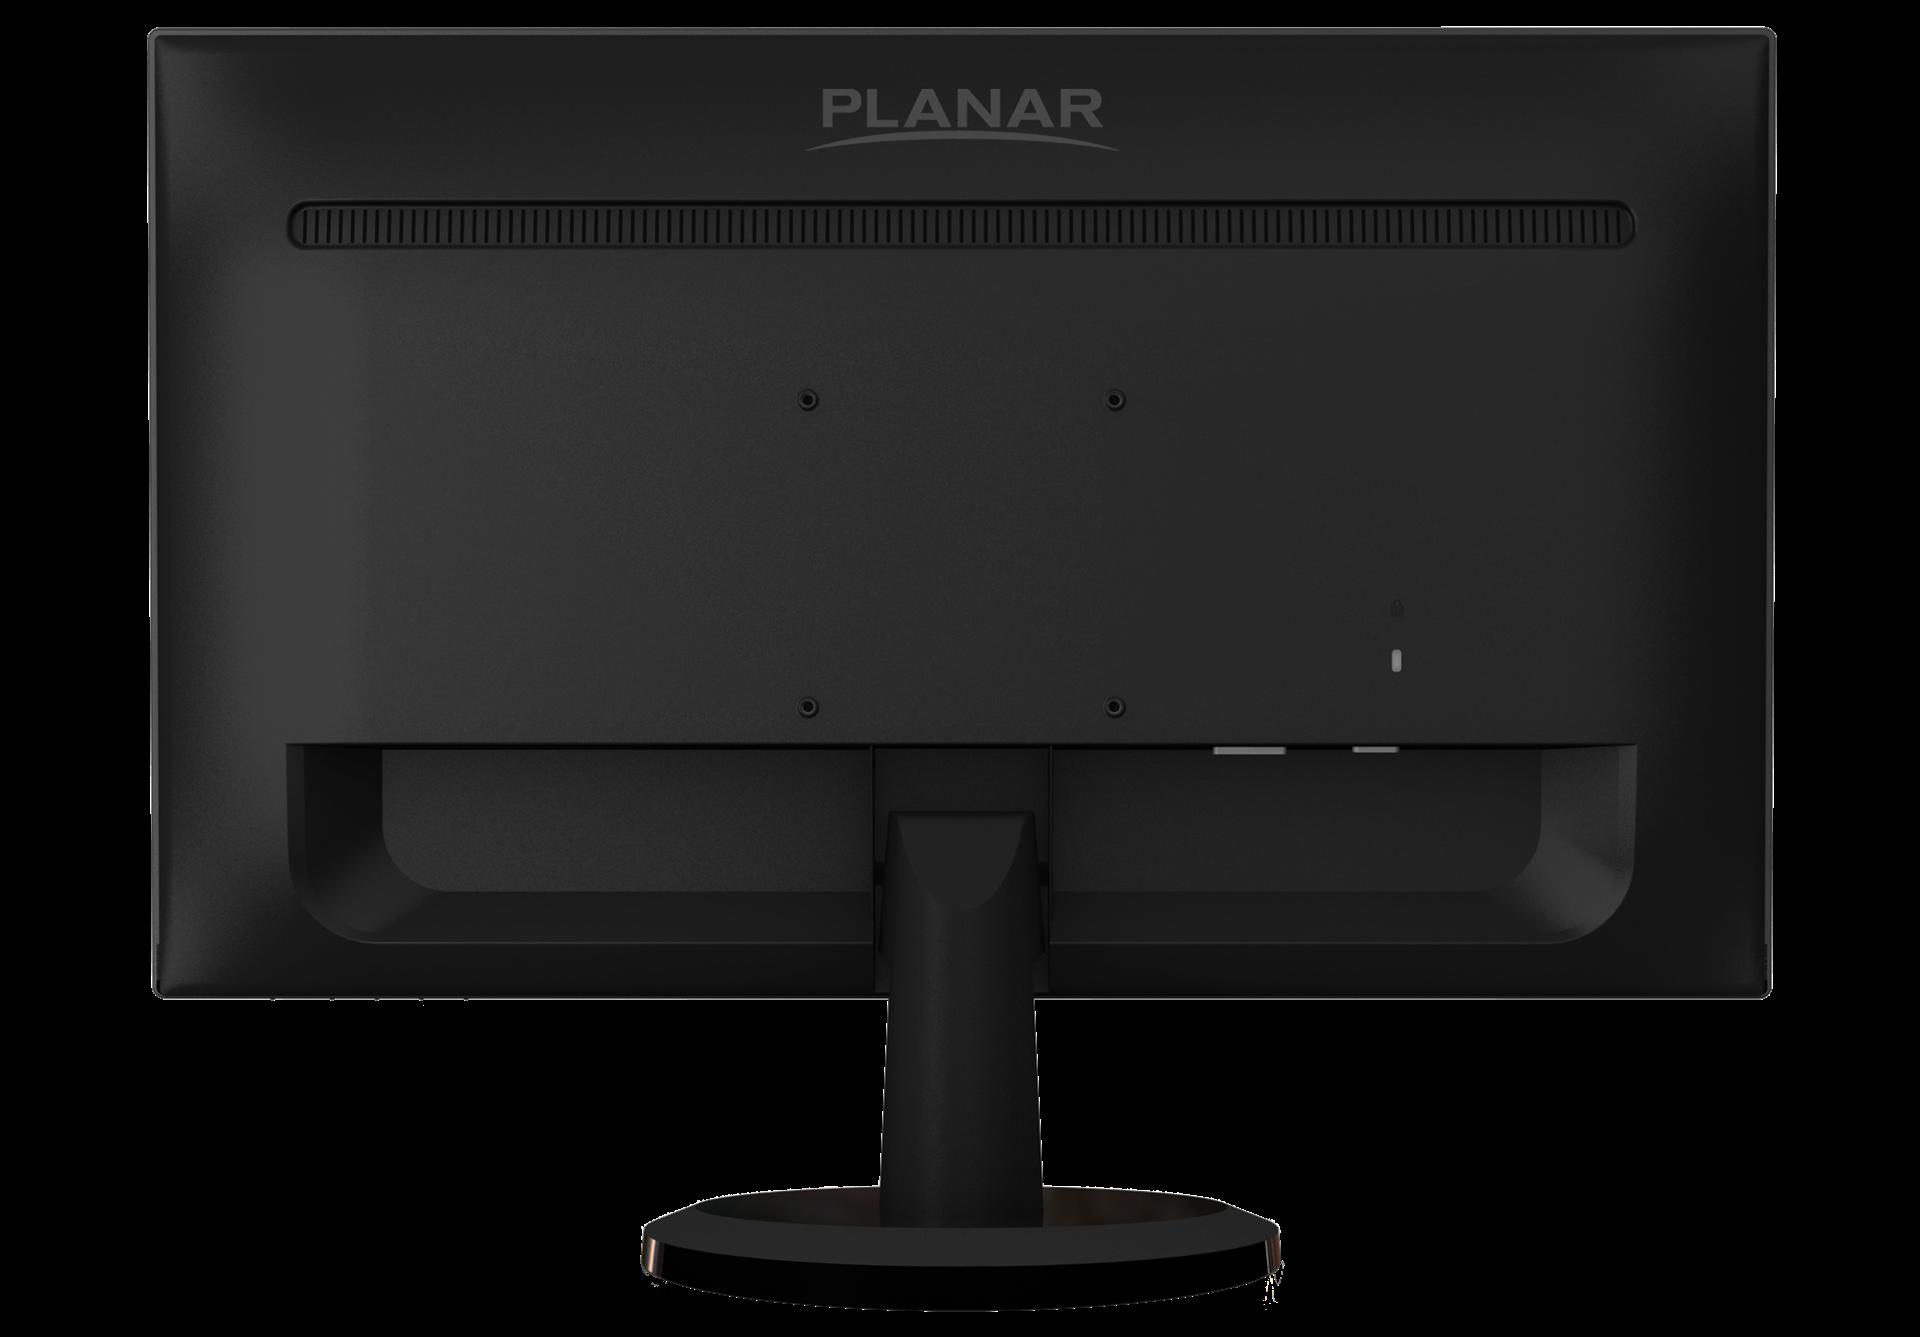 Pxn2470mw 24 Quot Lcd Monitor Planar